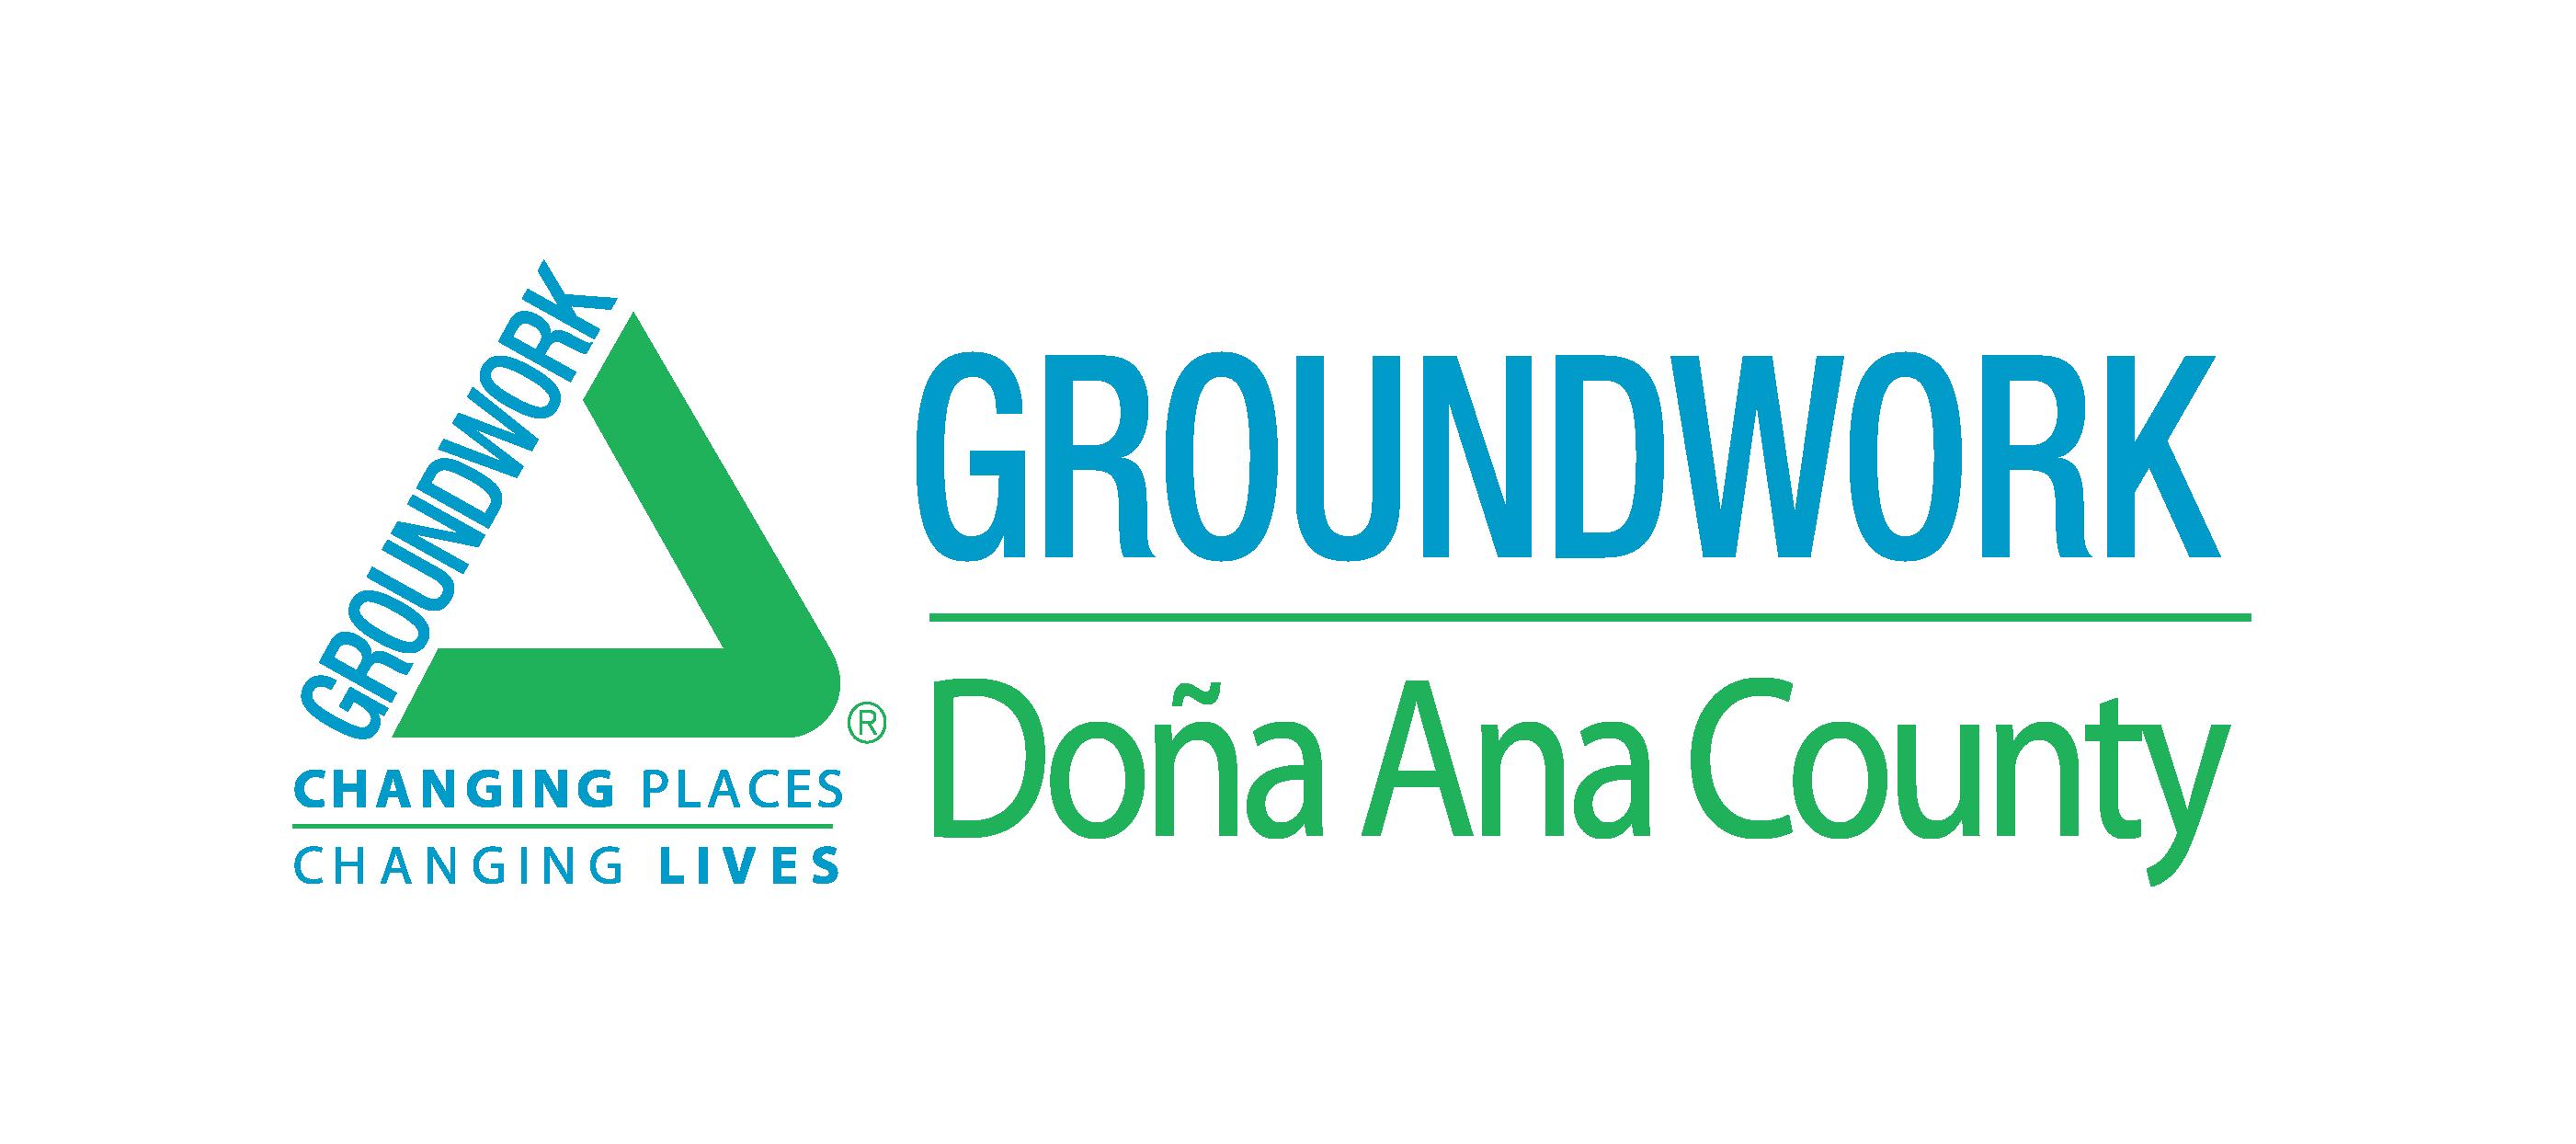 Groundwork Doña Ana County